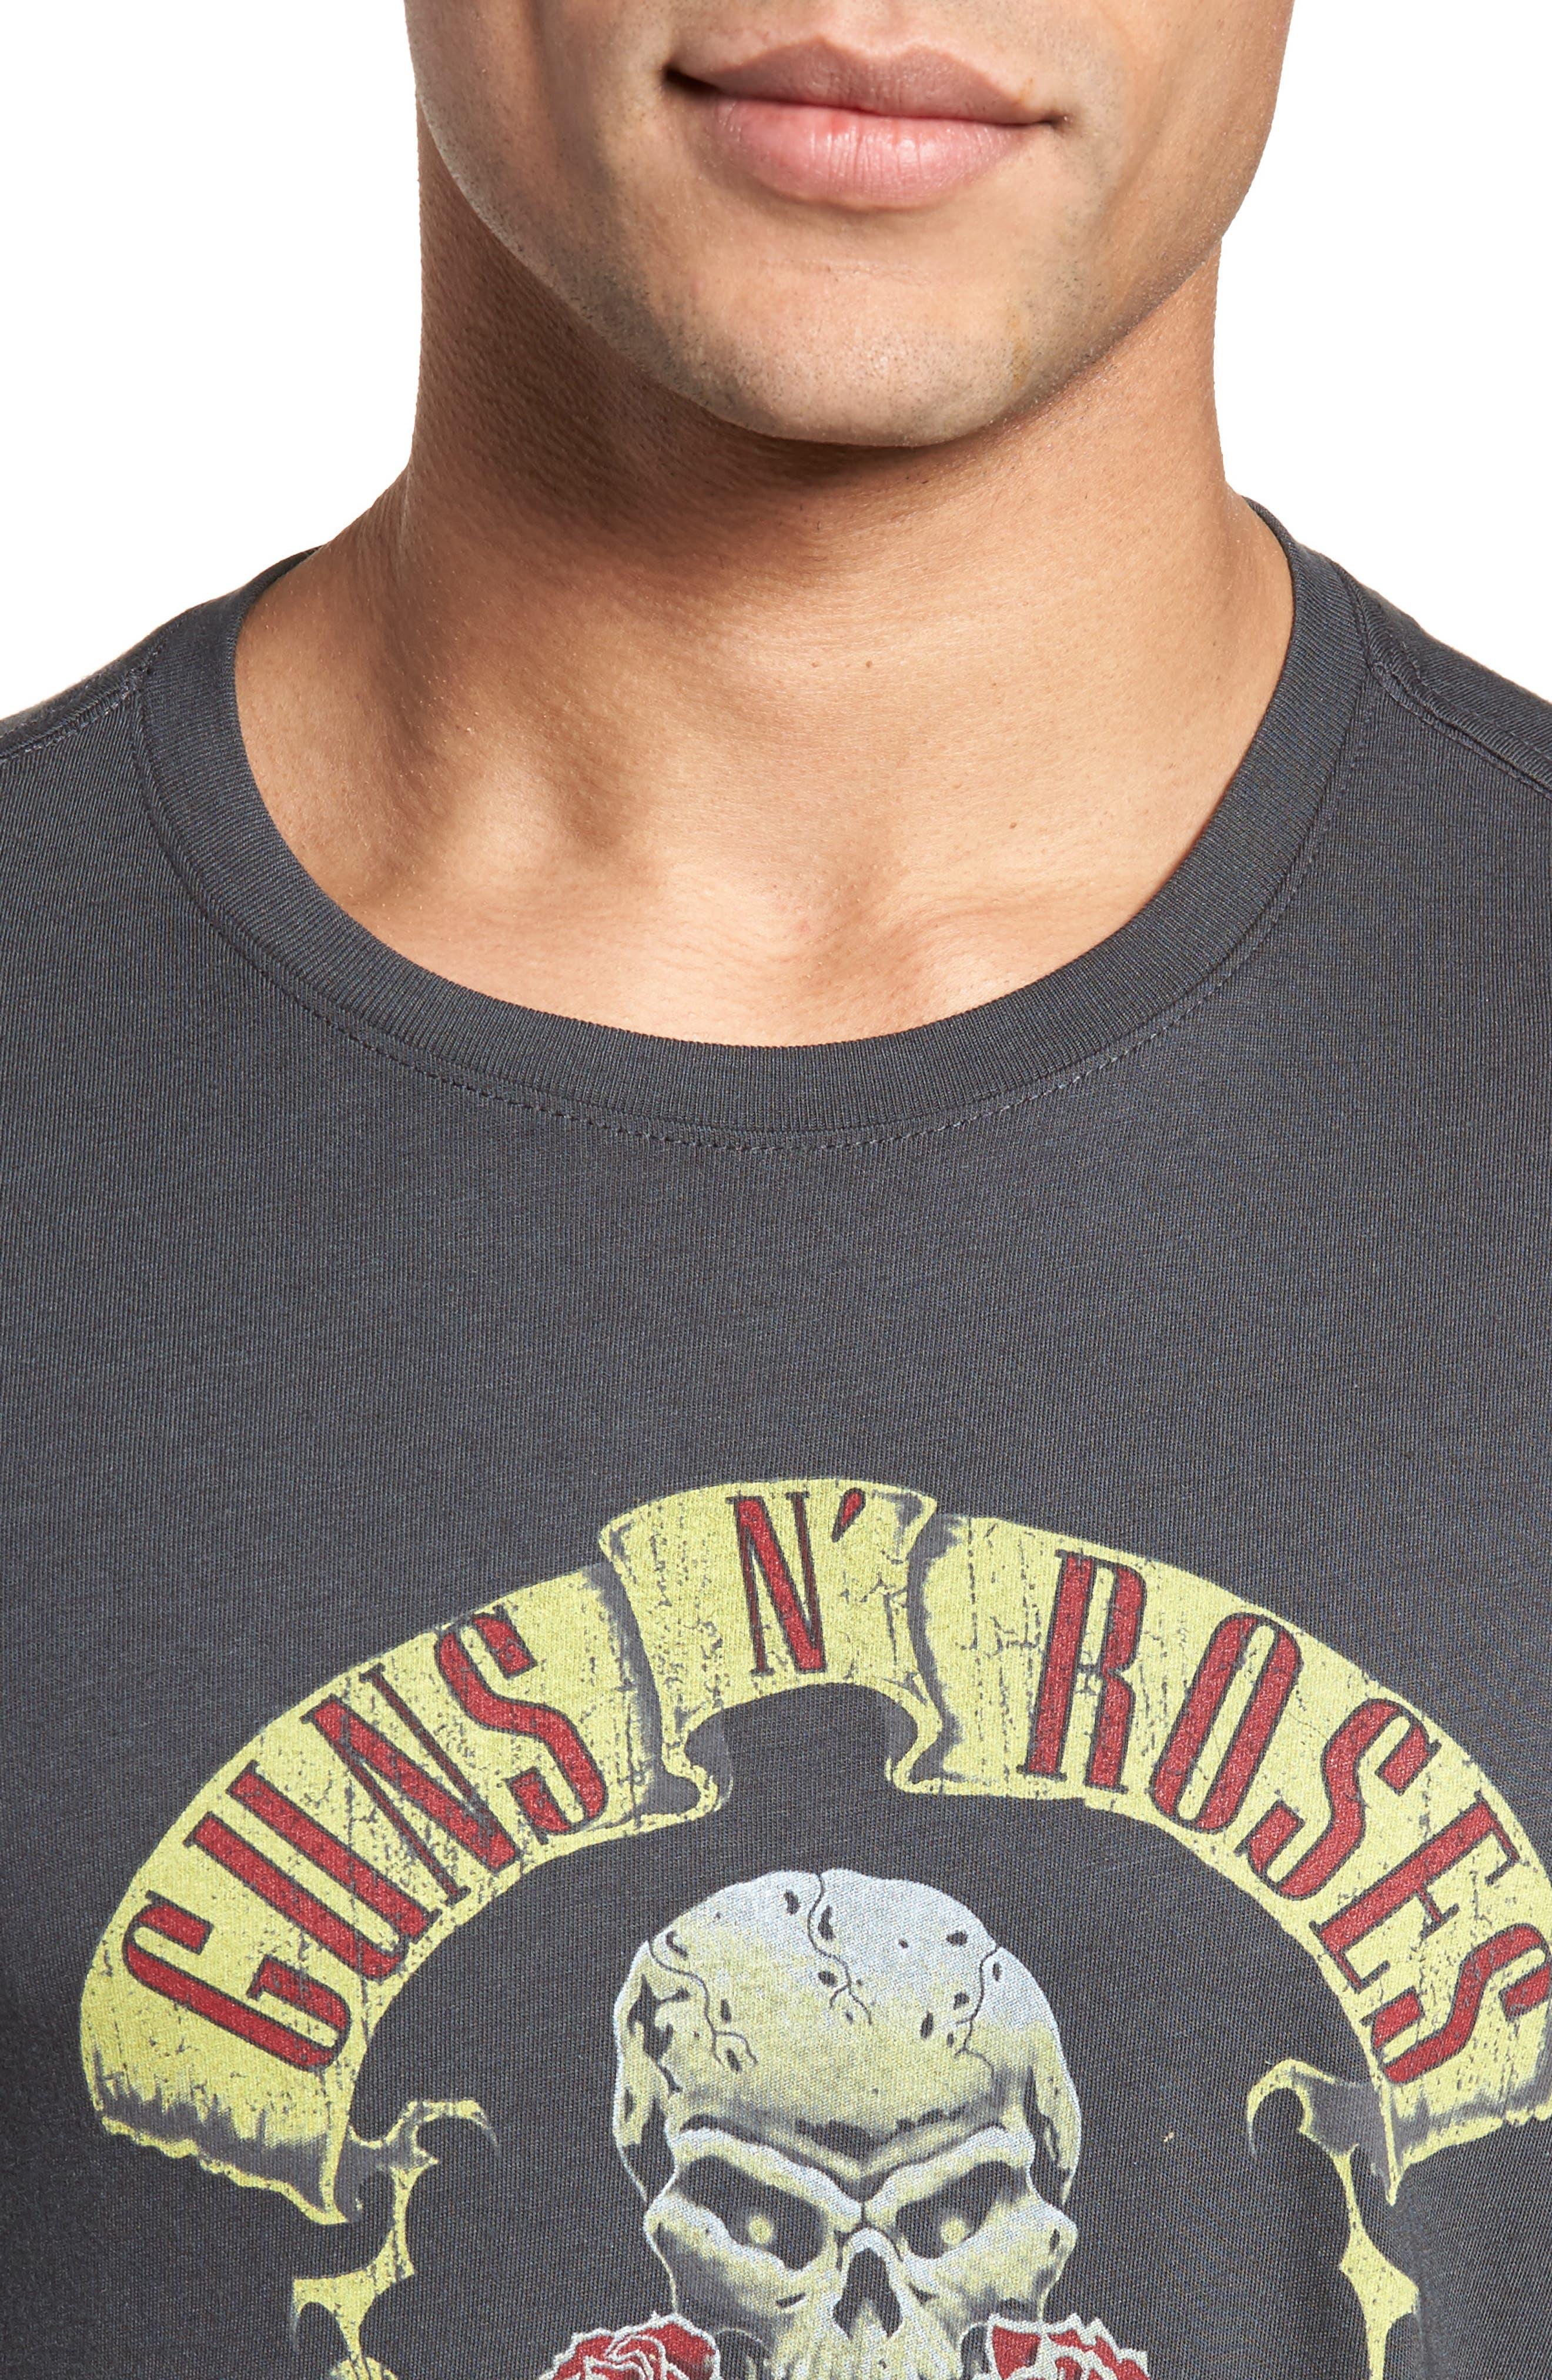 Guns N' Roses Graphic T-Shirt,                             Alternate thumbnail 4, color,                             013